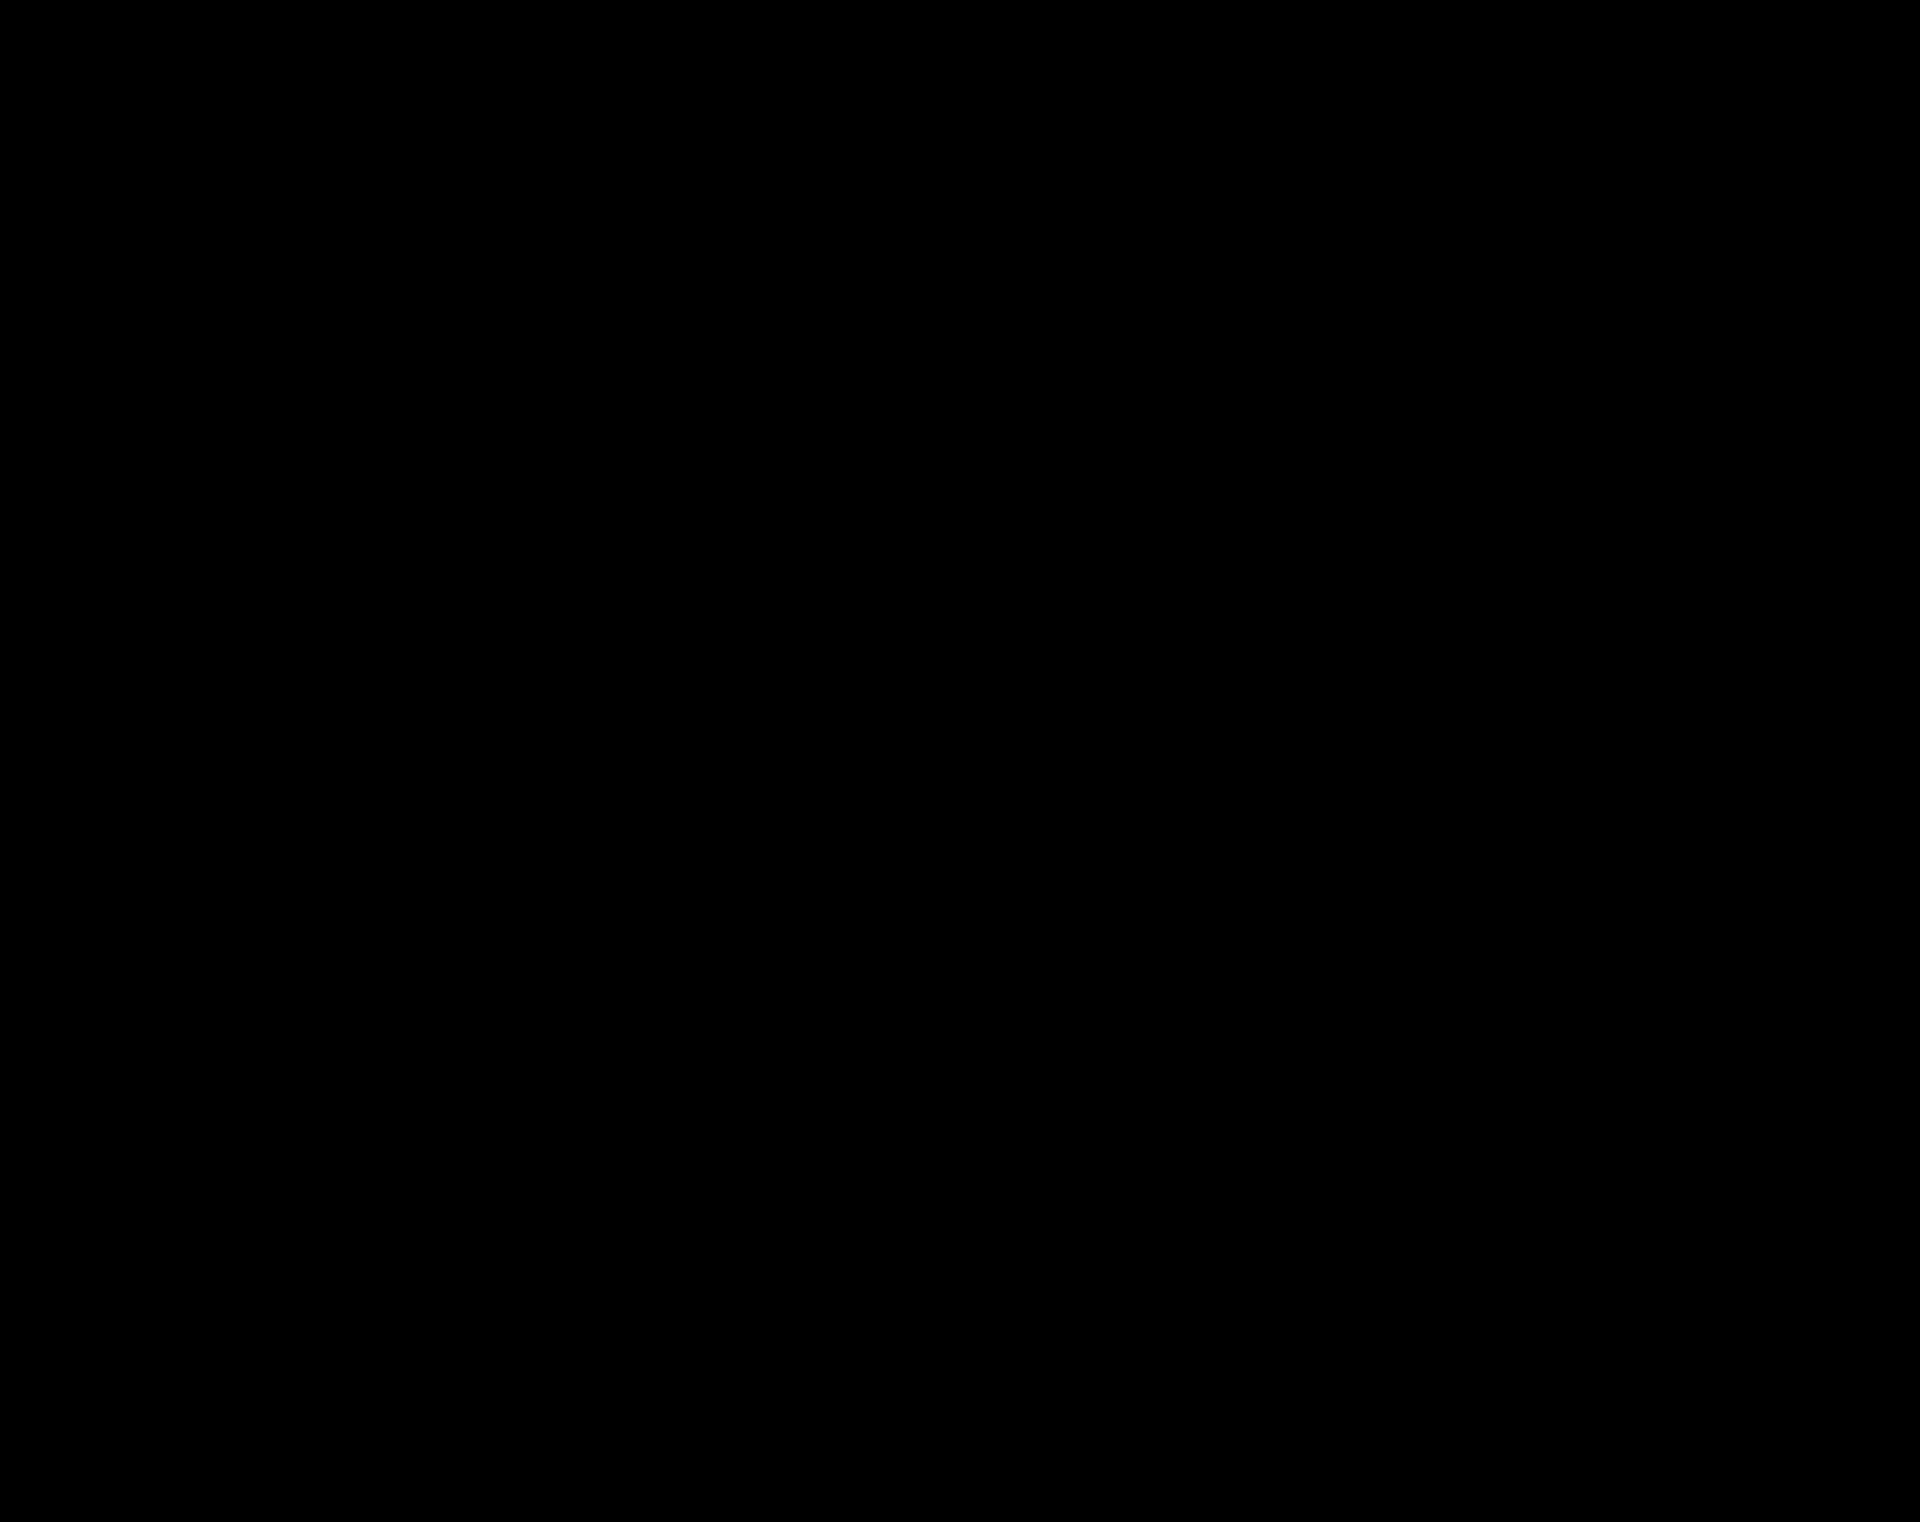 Nocturnes moon silhouette